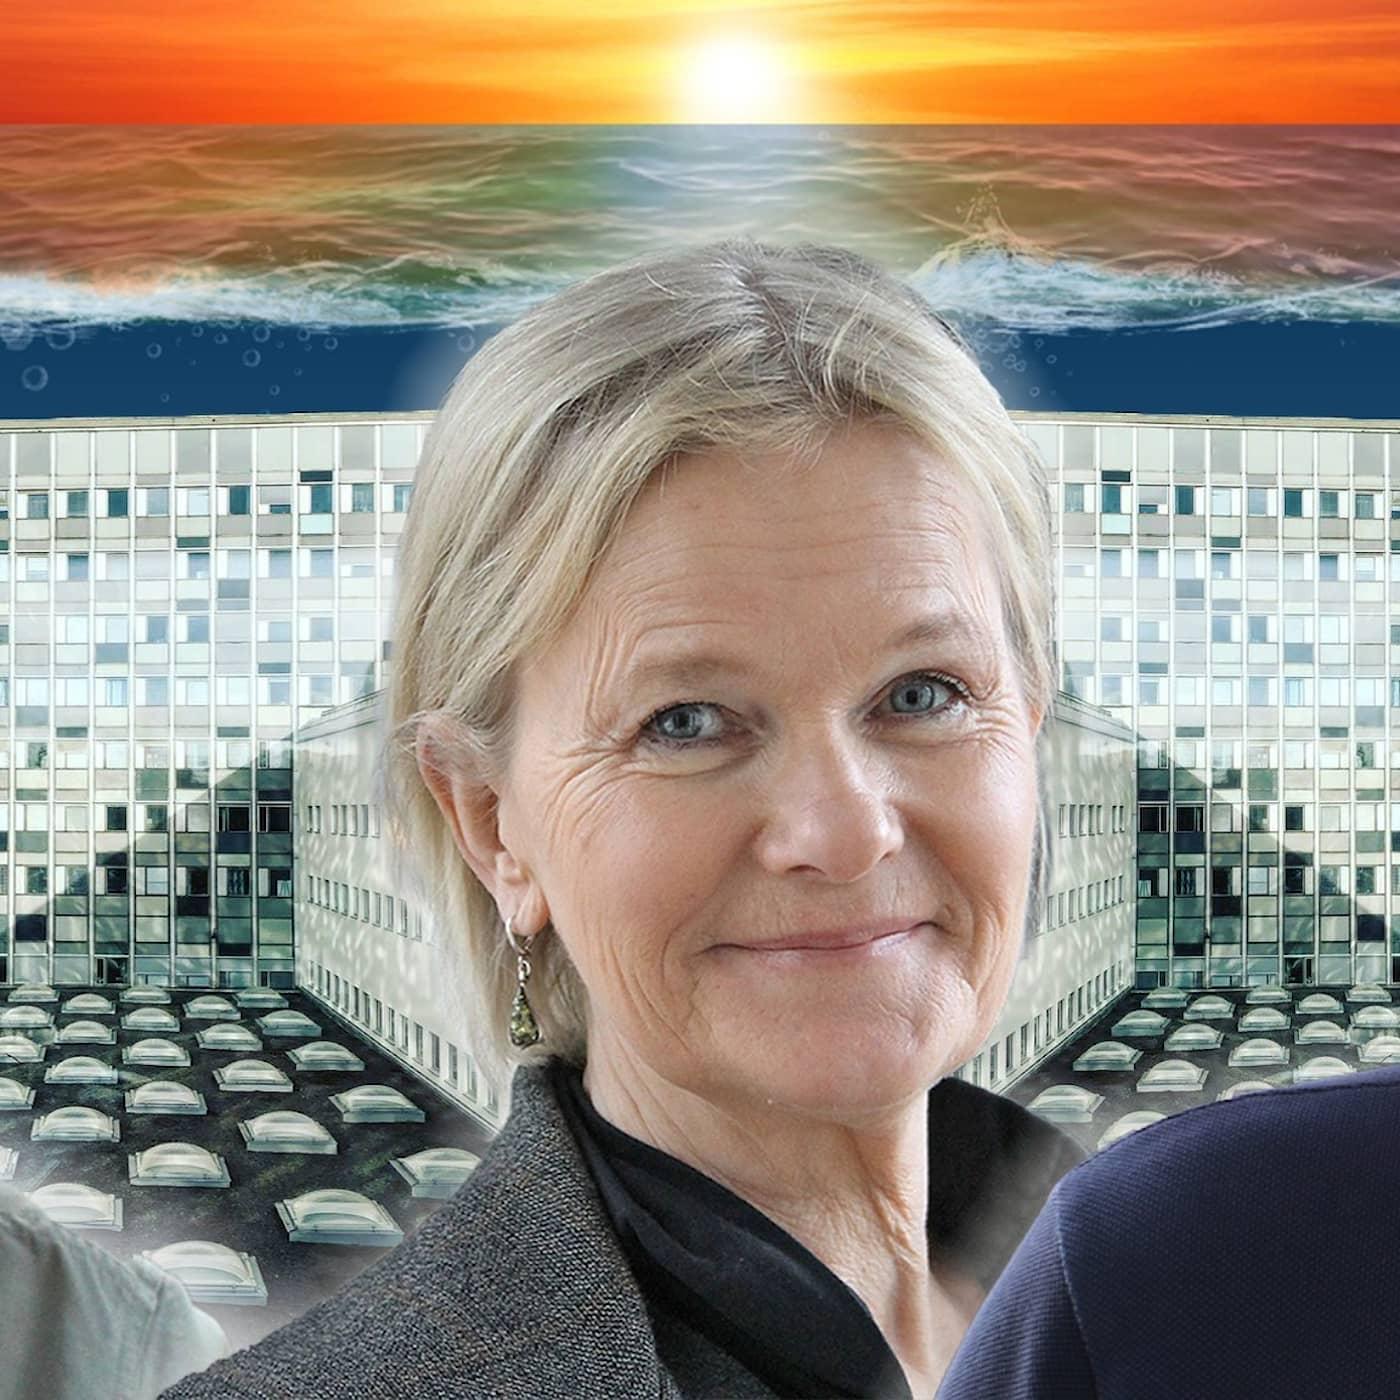 Niklas Källner: Titel i kläm, Sissela Kyle: Irriterande resande. Jonathan Lindström: Coronakonsulenten